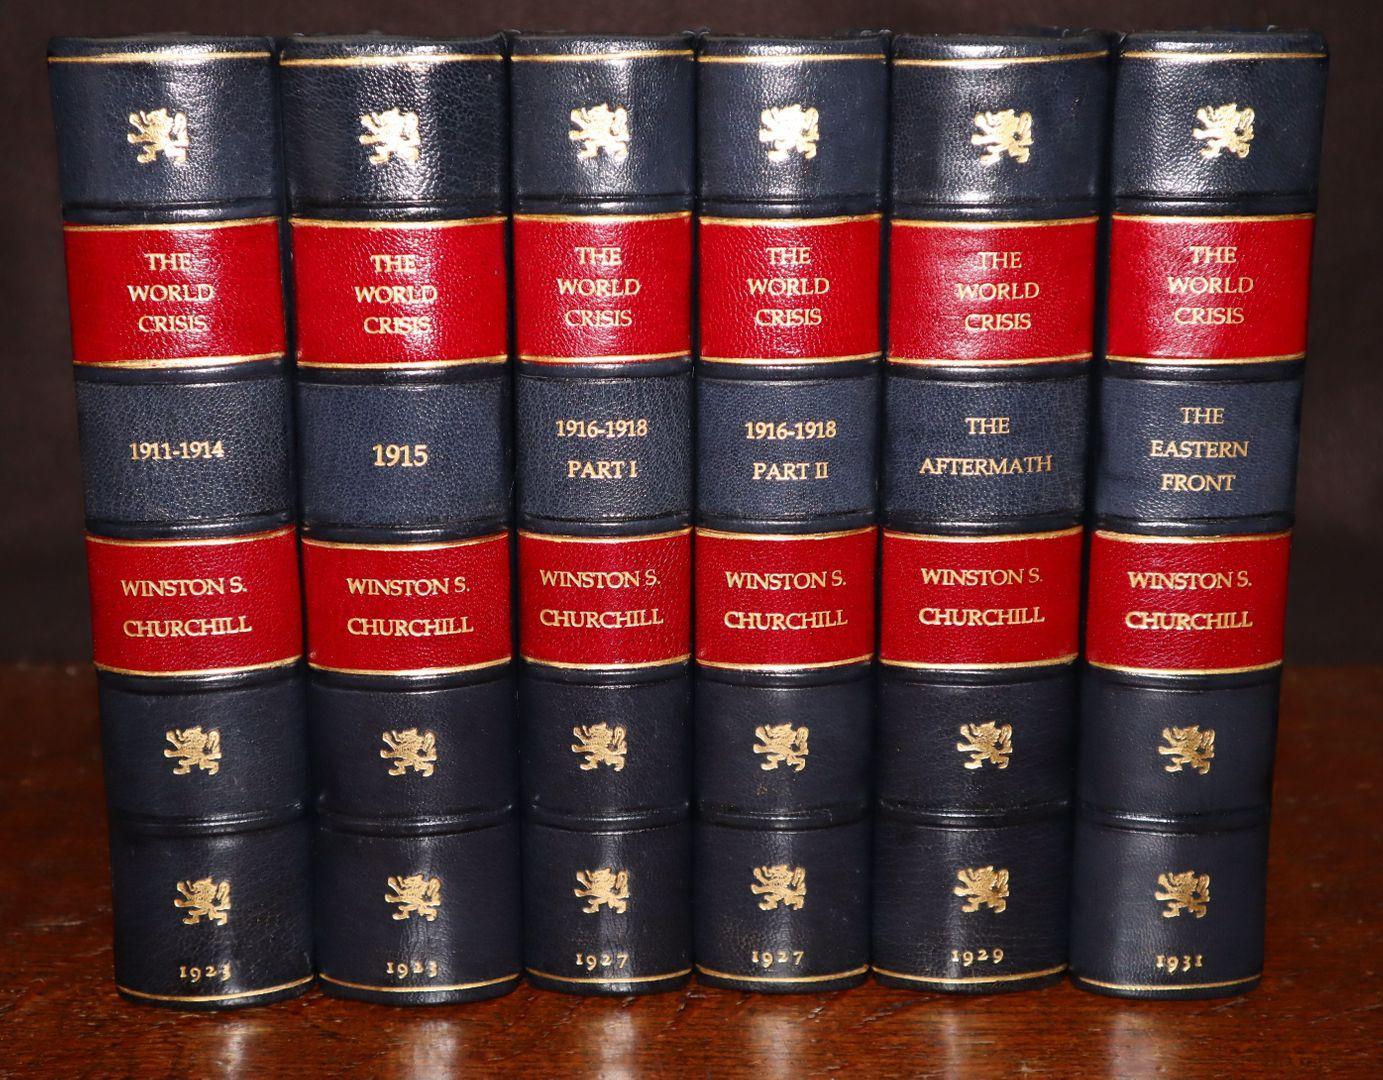 The World Crisis Vol I. 1911-1914 Vol: Winston Spencer CHURCHILL